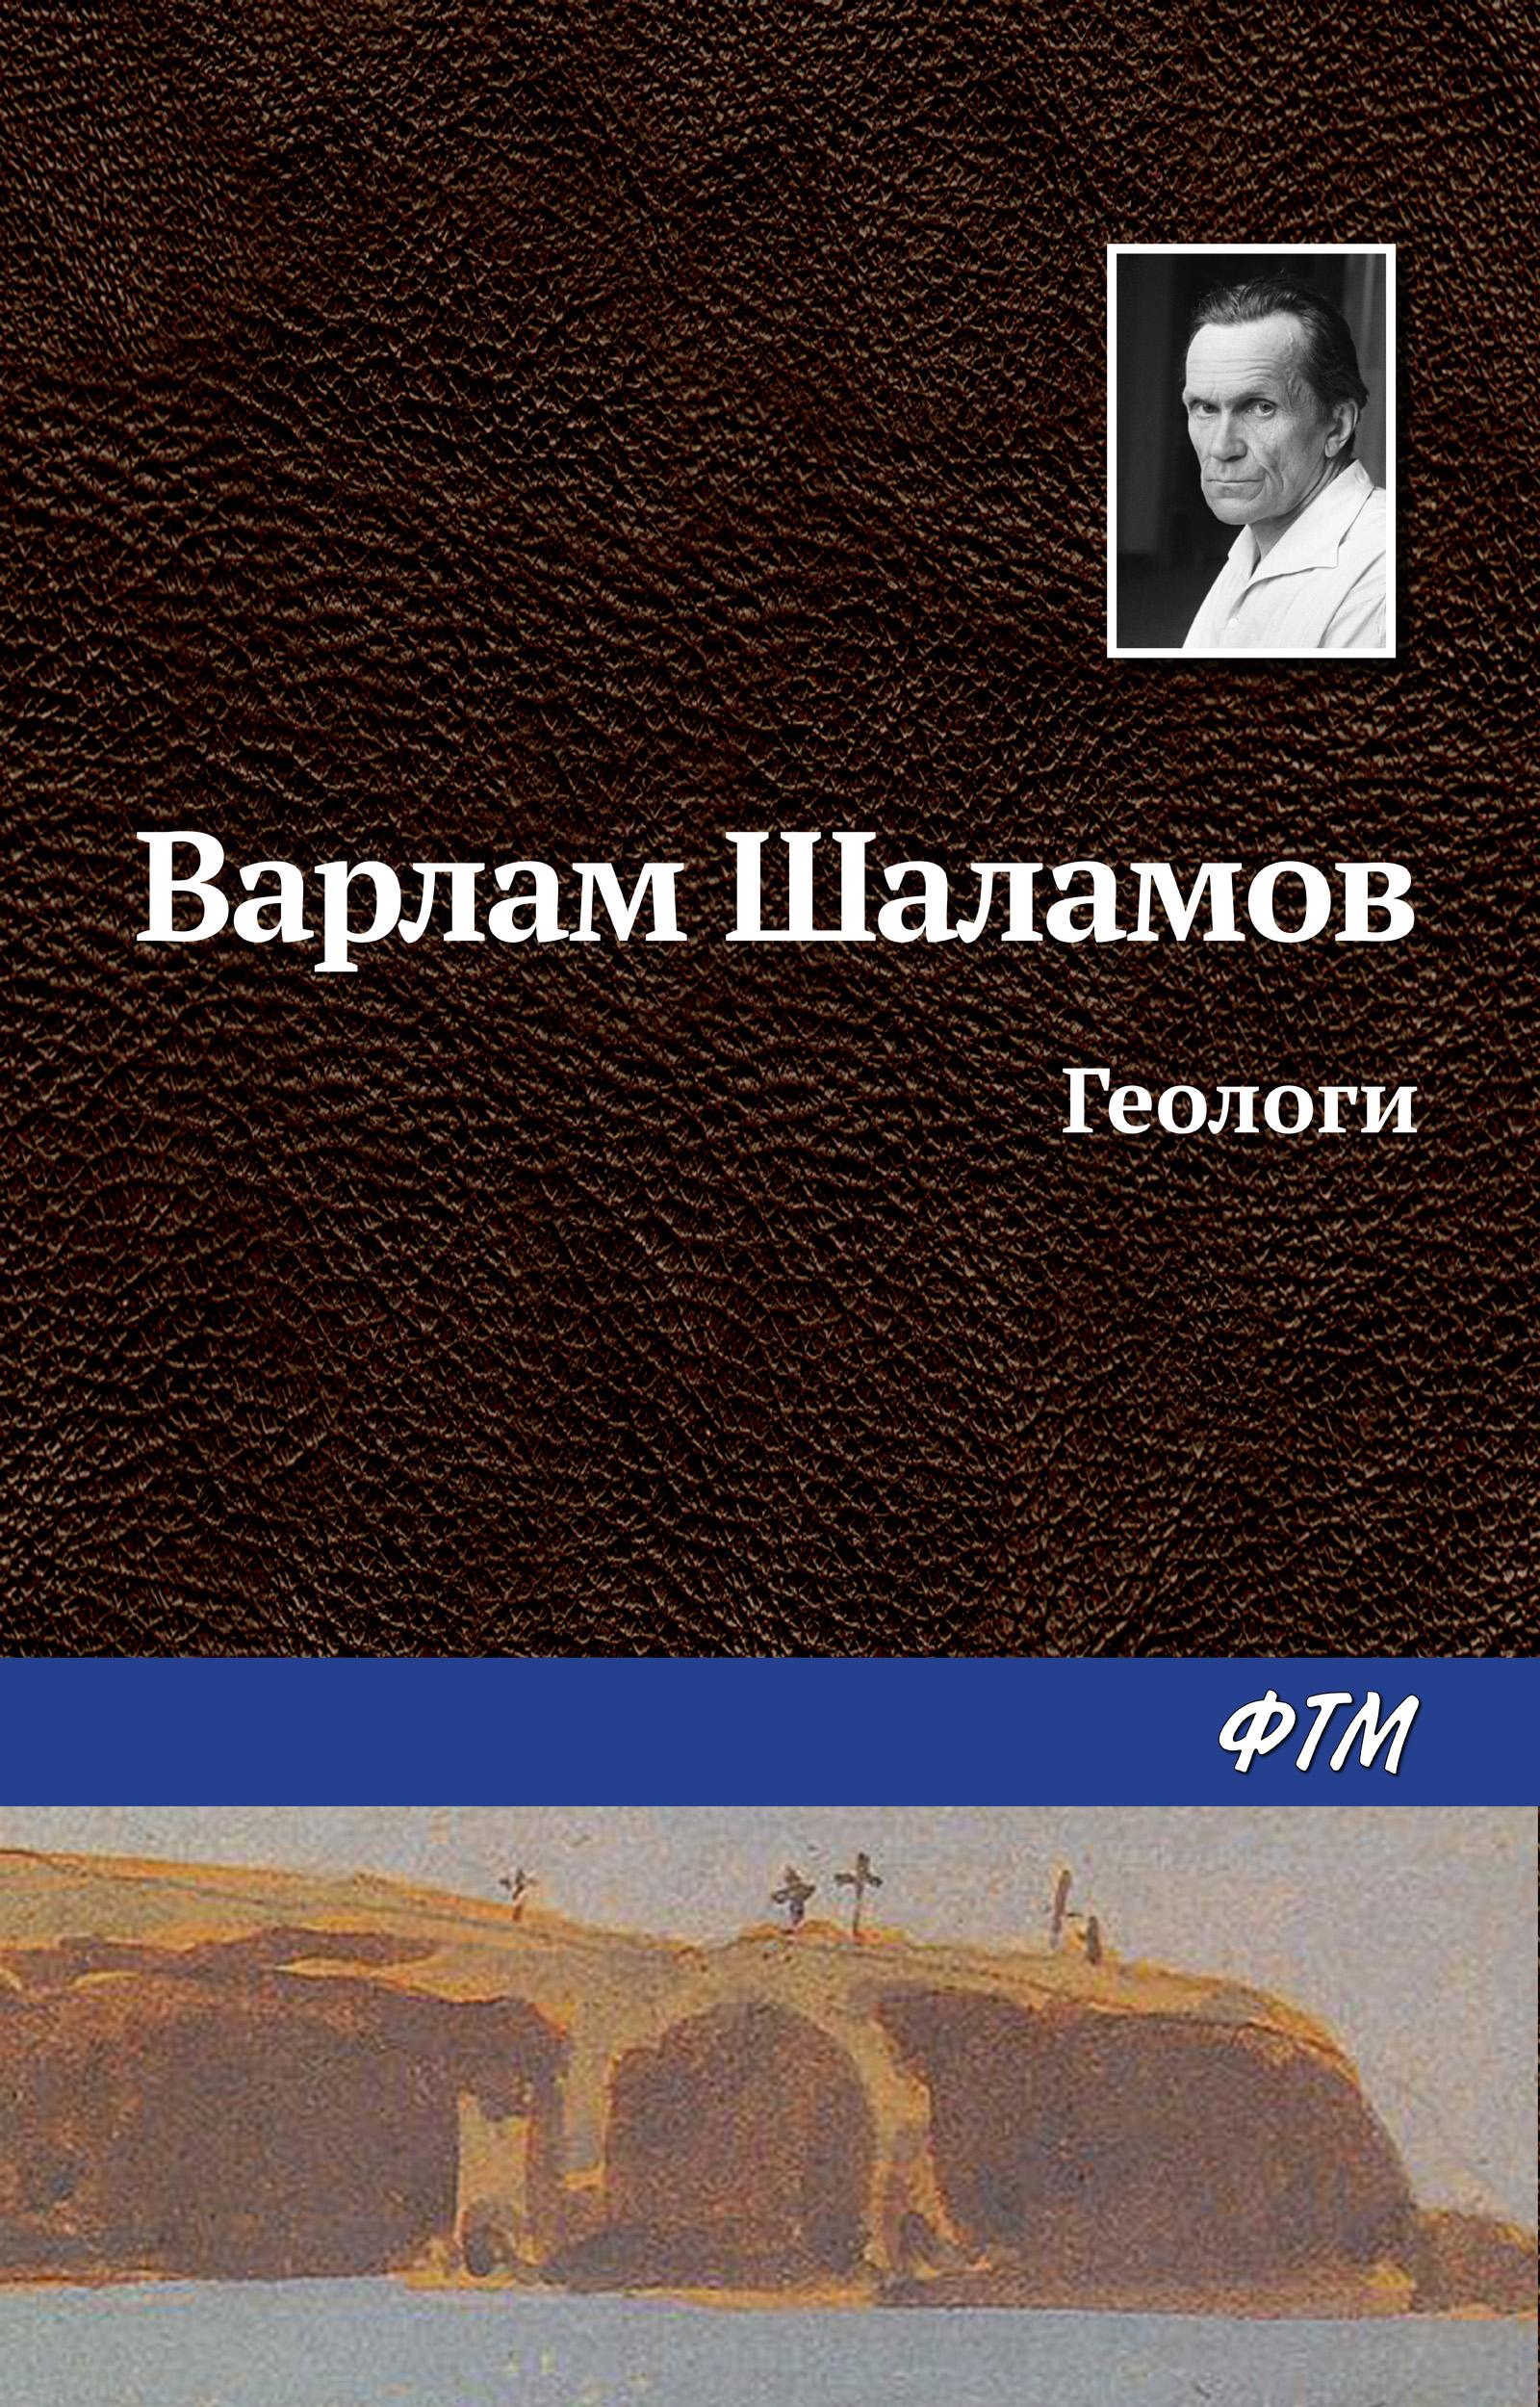 Варлам Шаламов Геологи